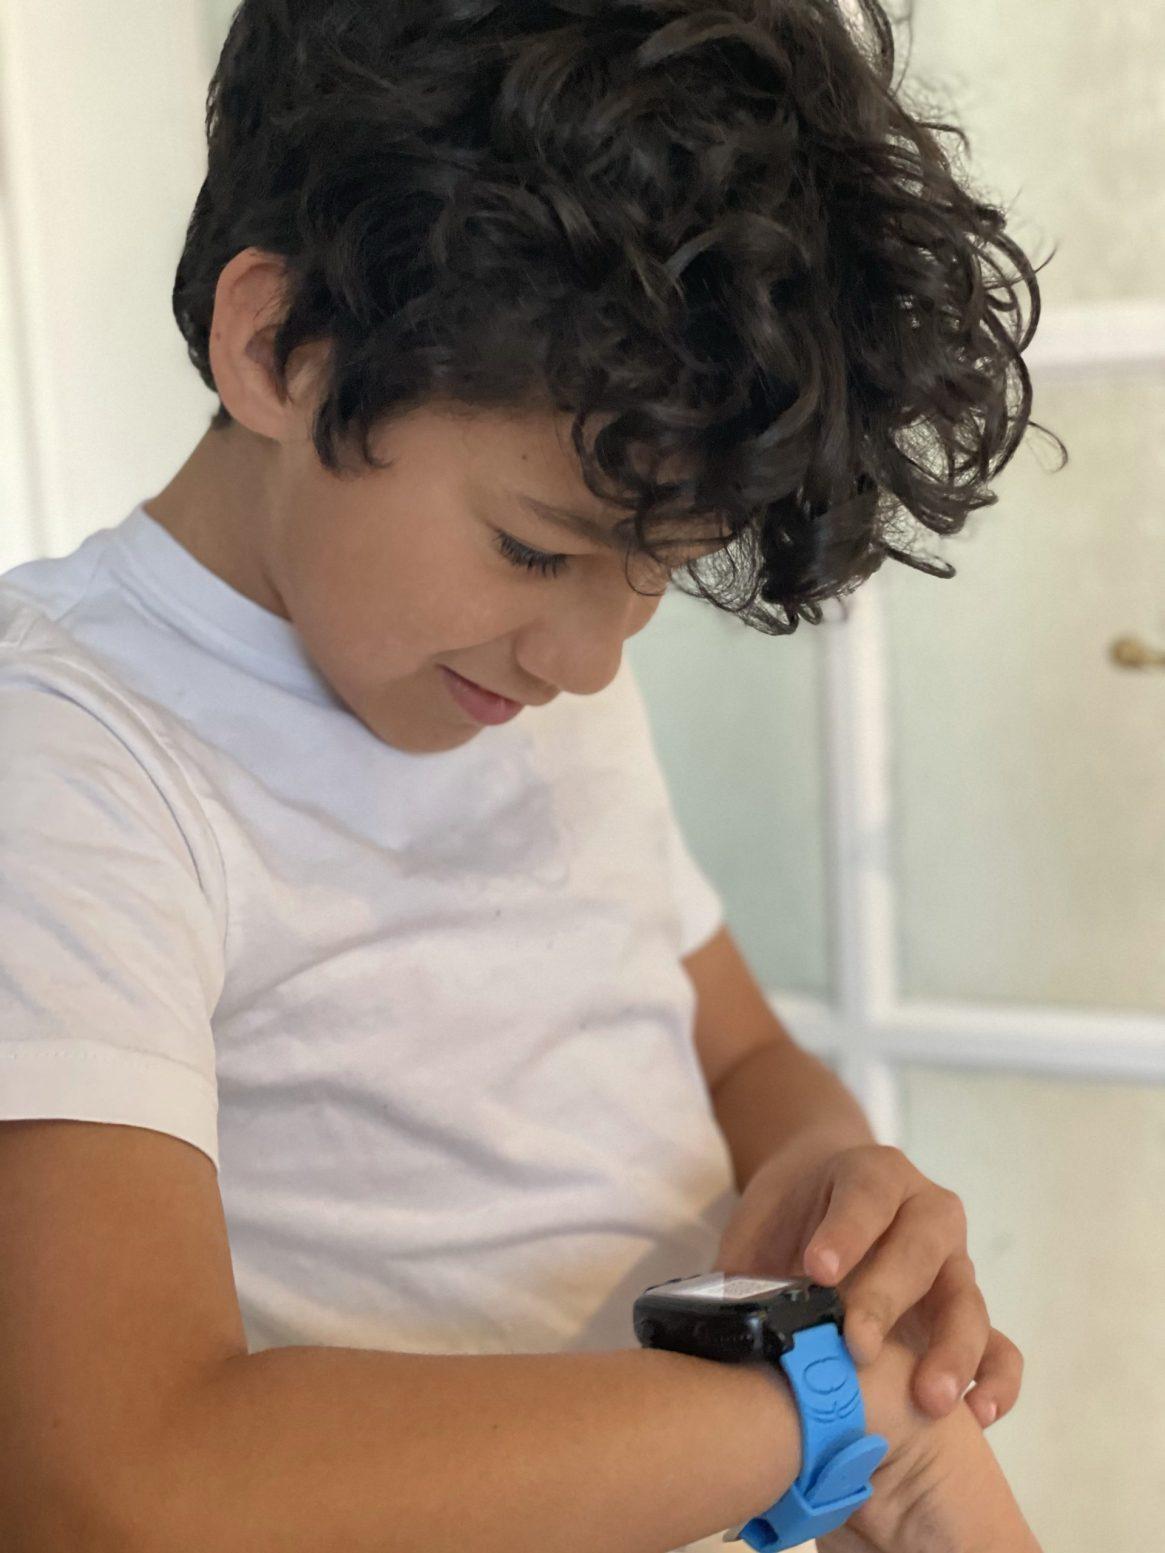 child using xplora2 go smartwatch